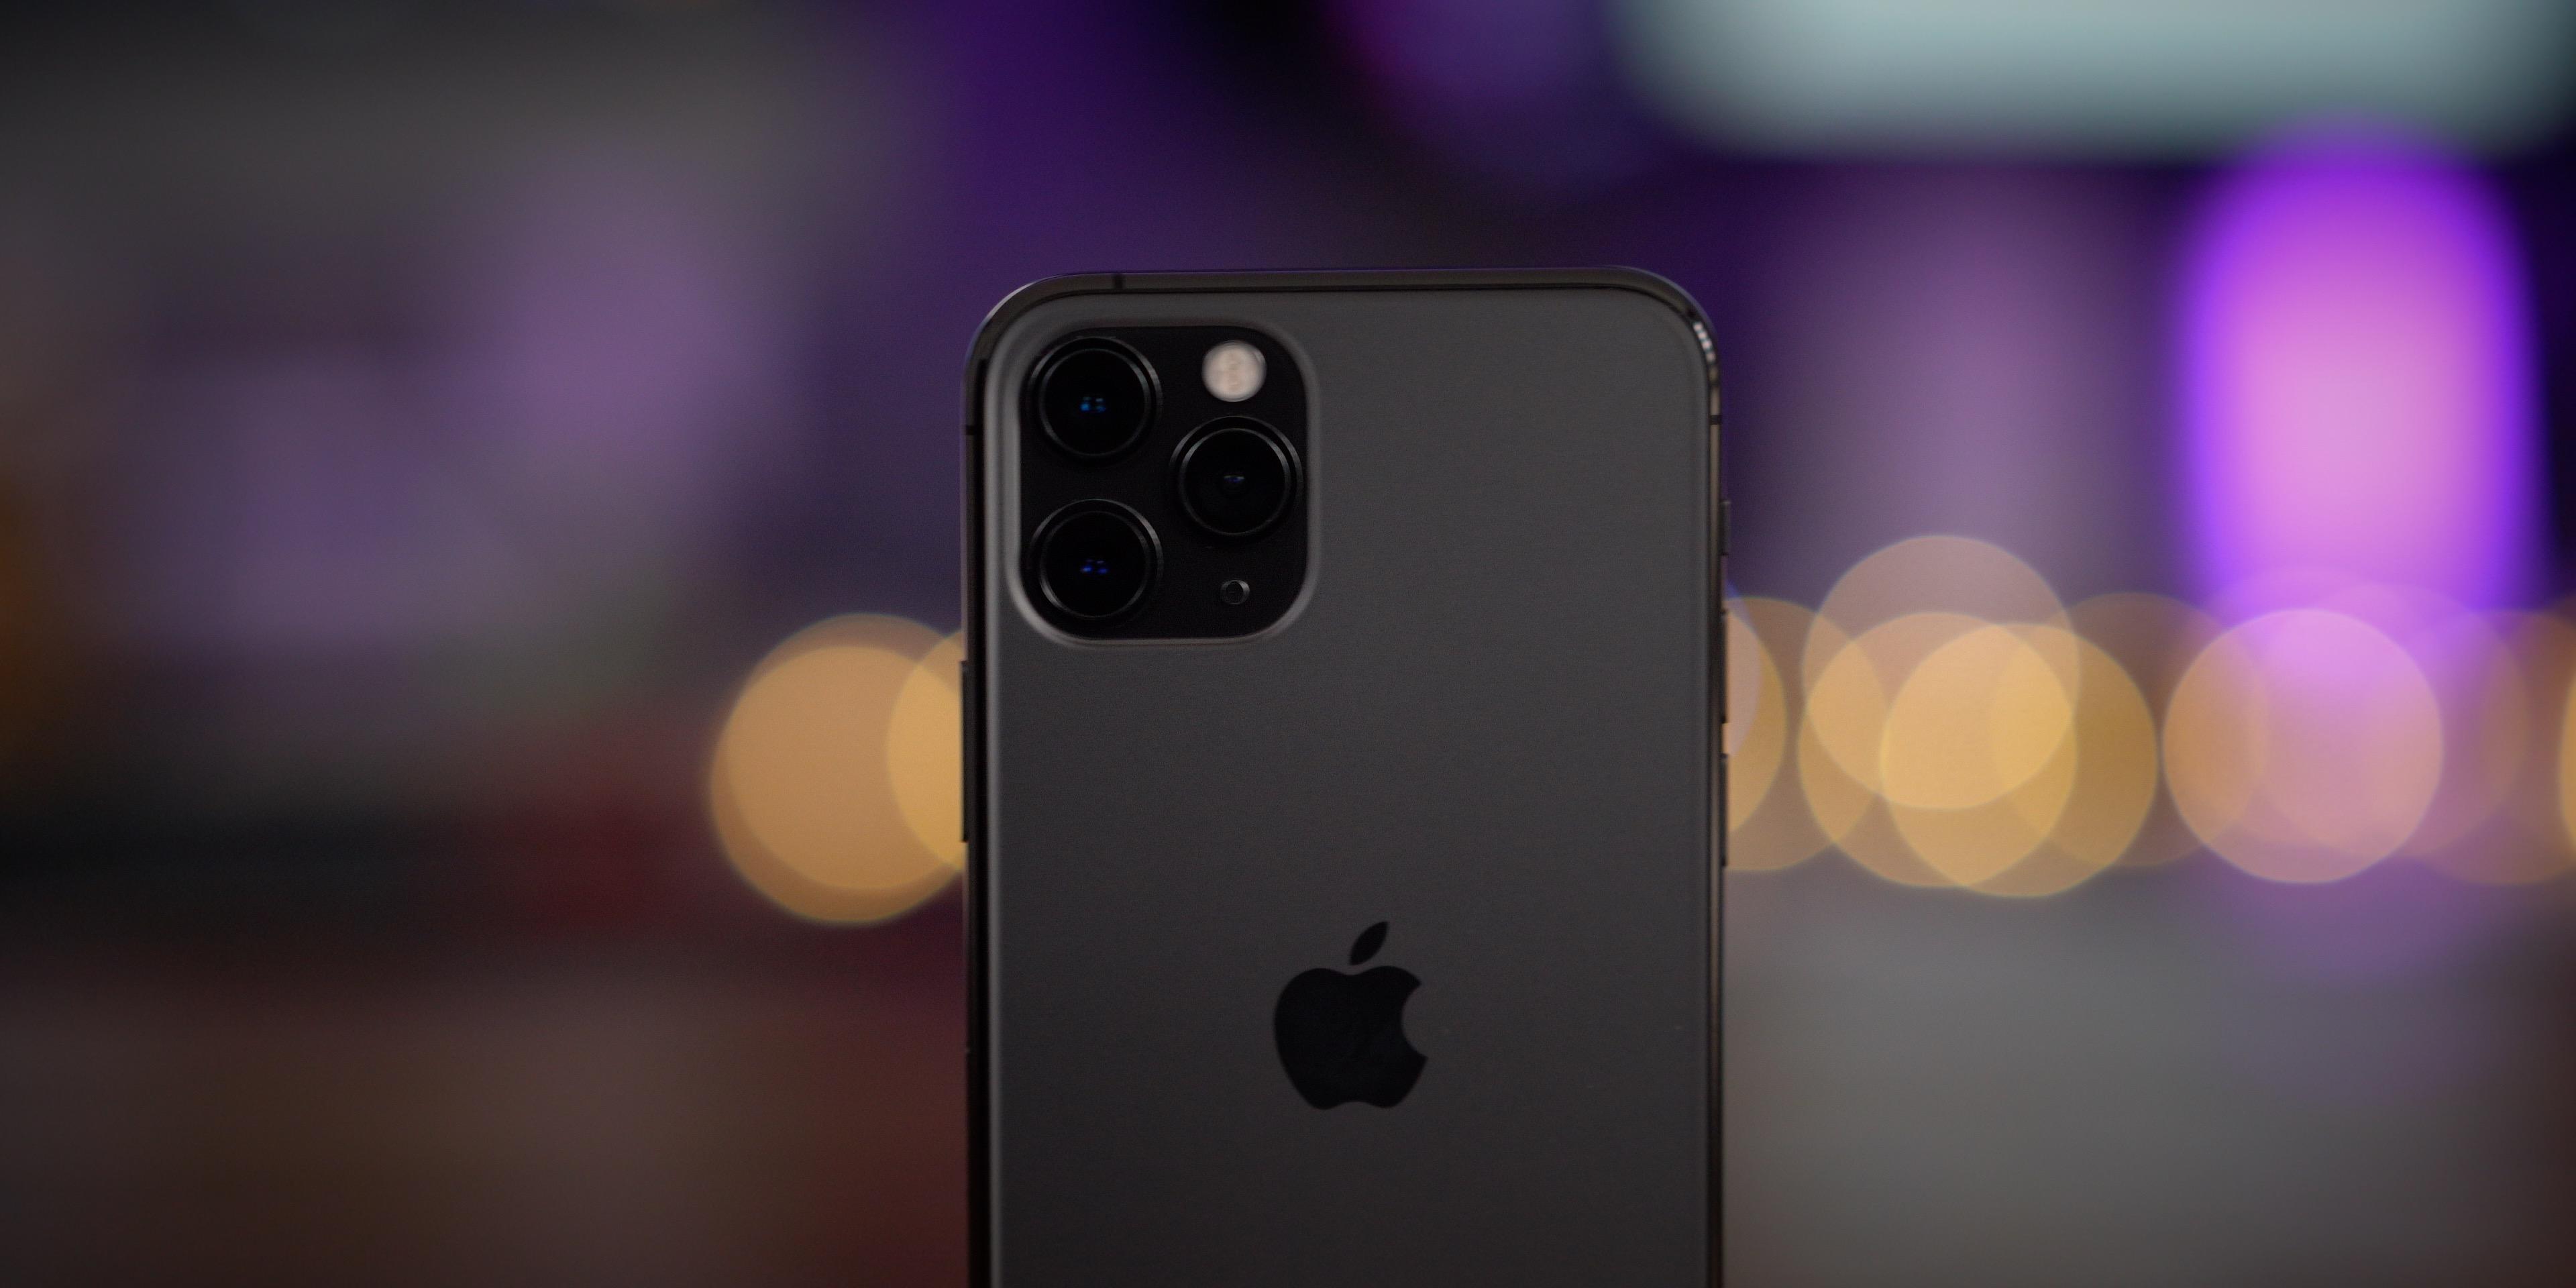 iPhone 11 pro telephoto lens